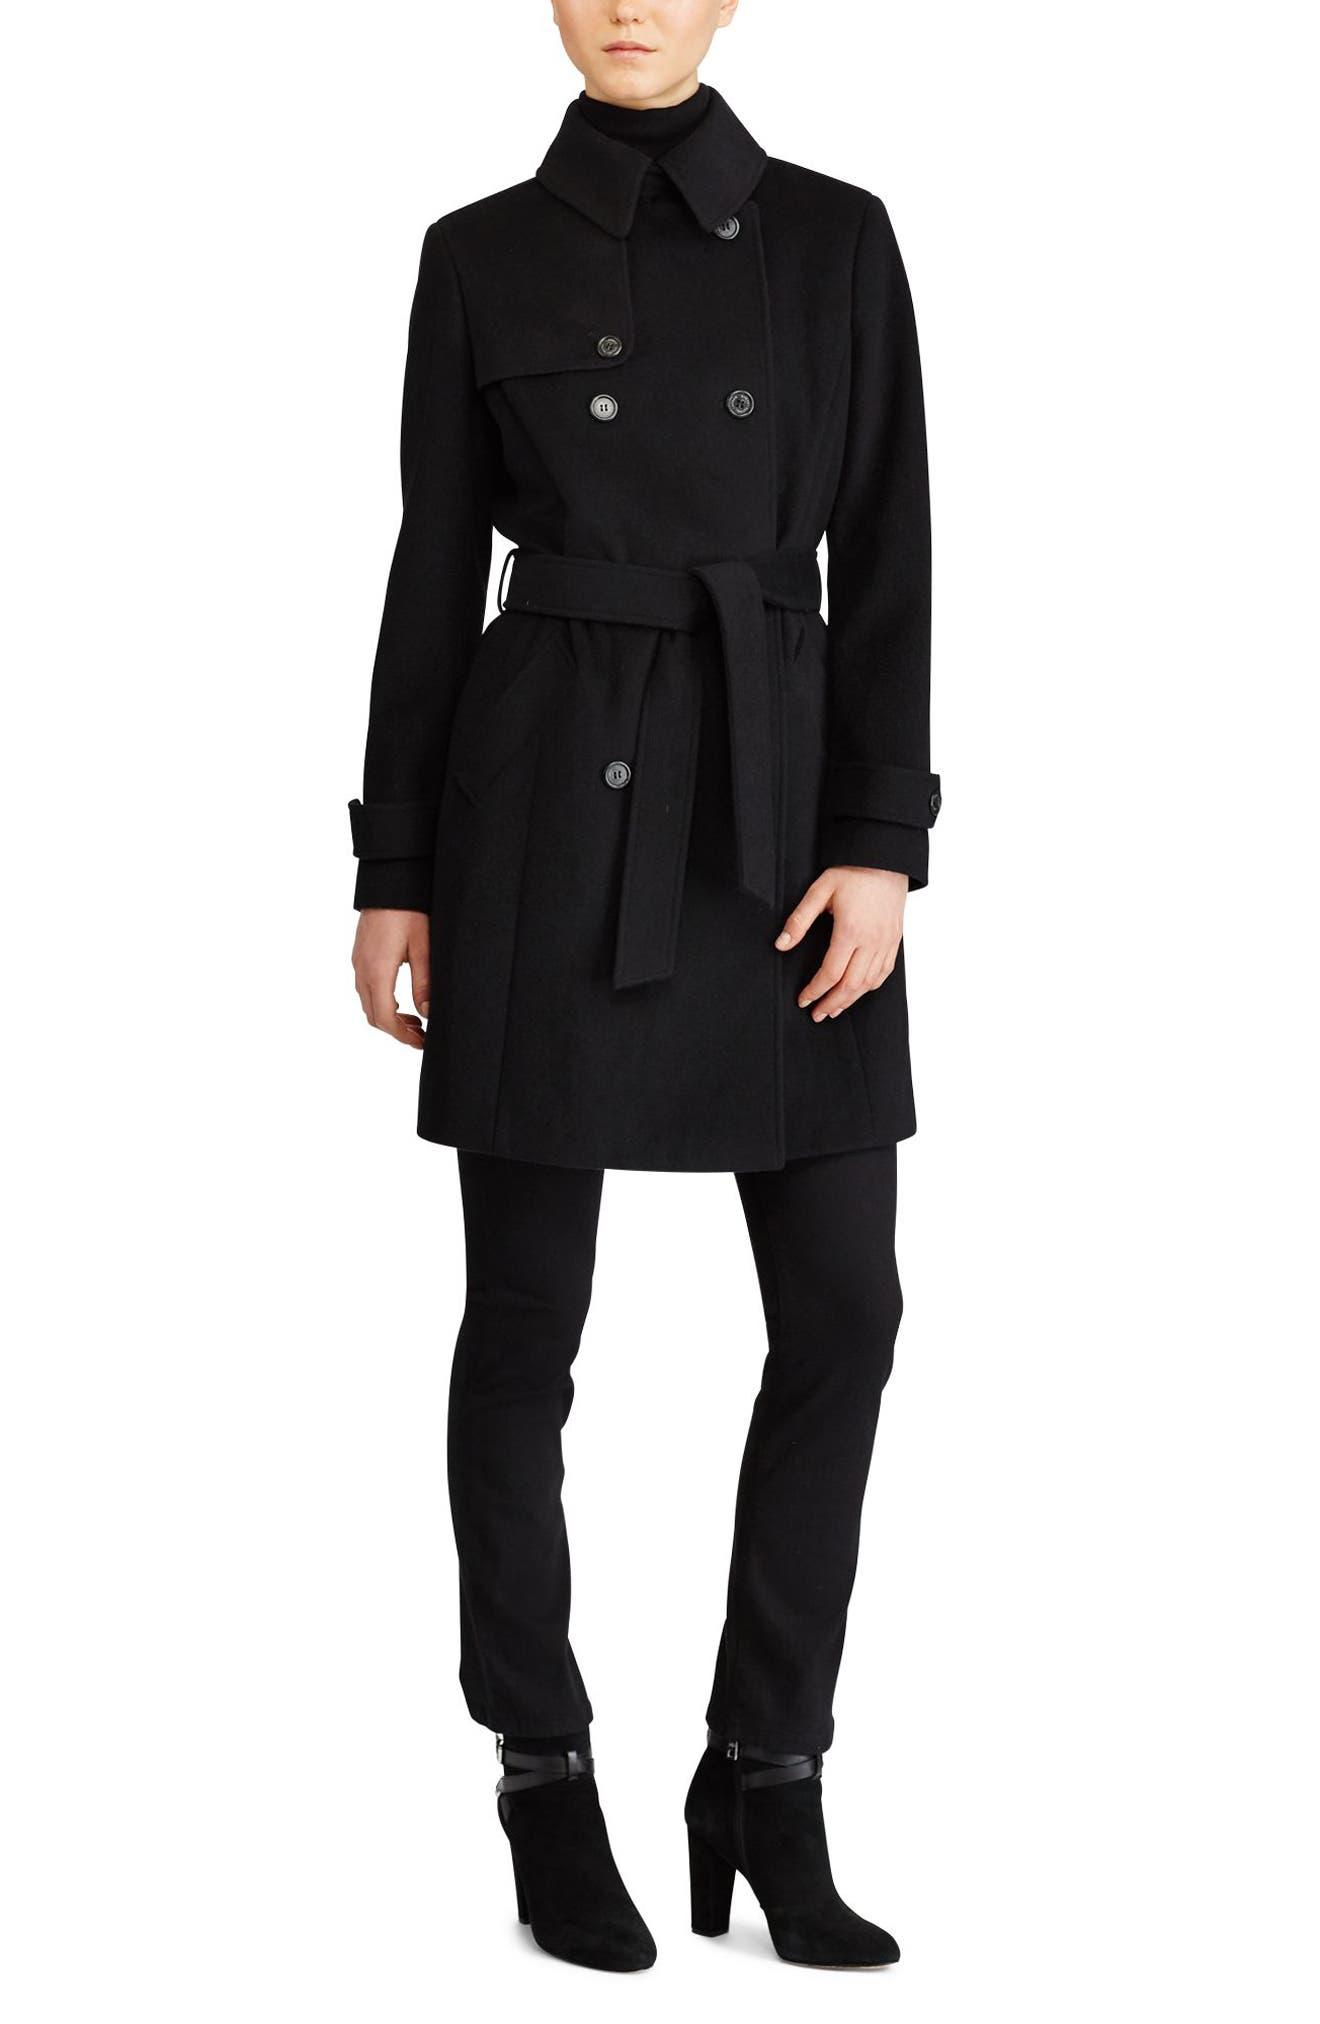 Wool Blend Trench Coat,                             Alternate thumbnail 2, color,                             Black